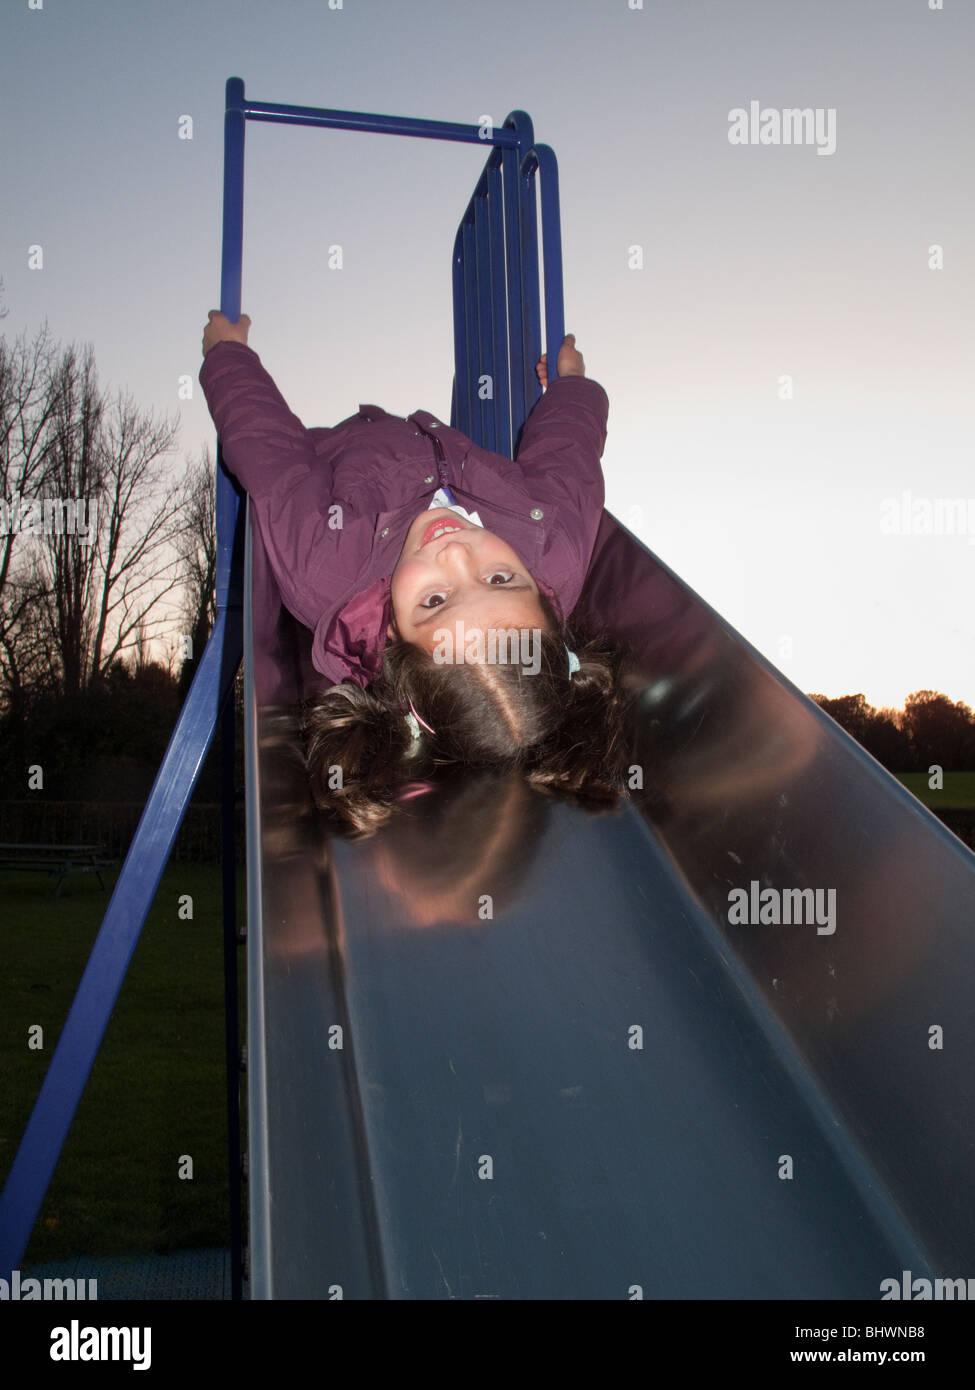 child on a playground slide - Stock Image